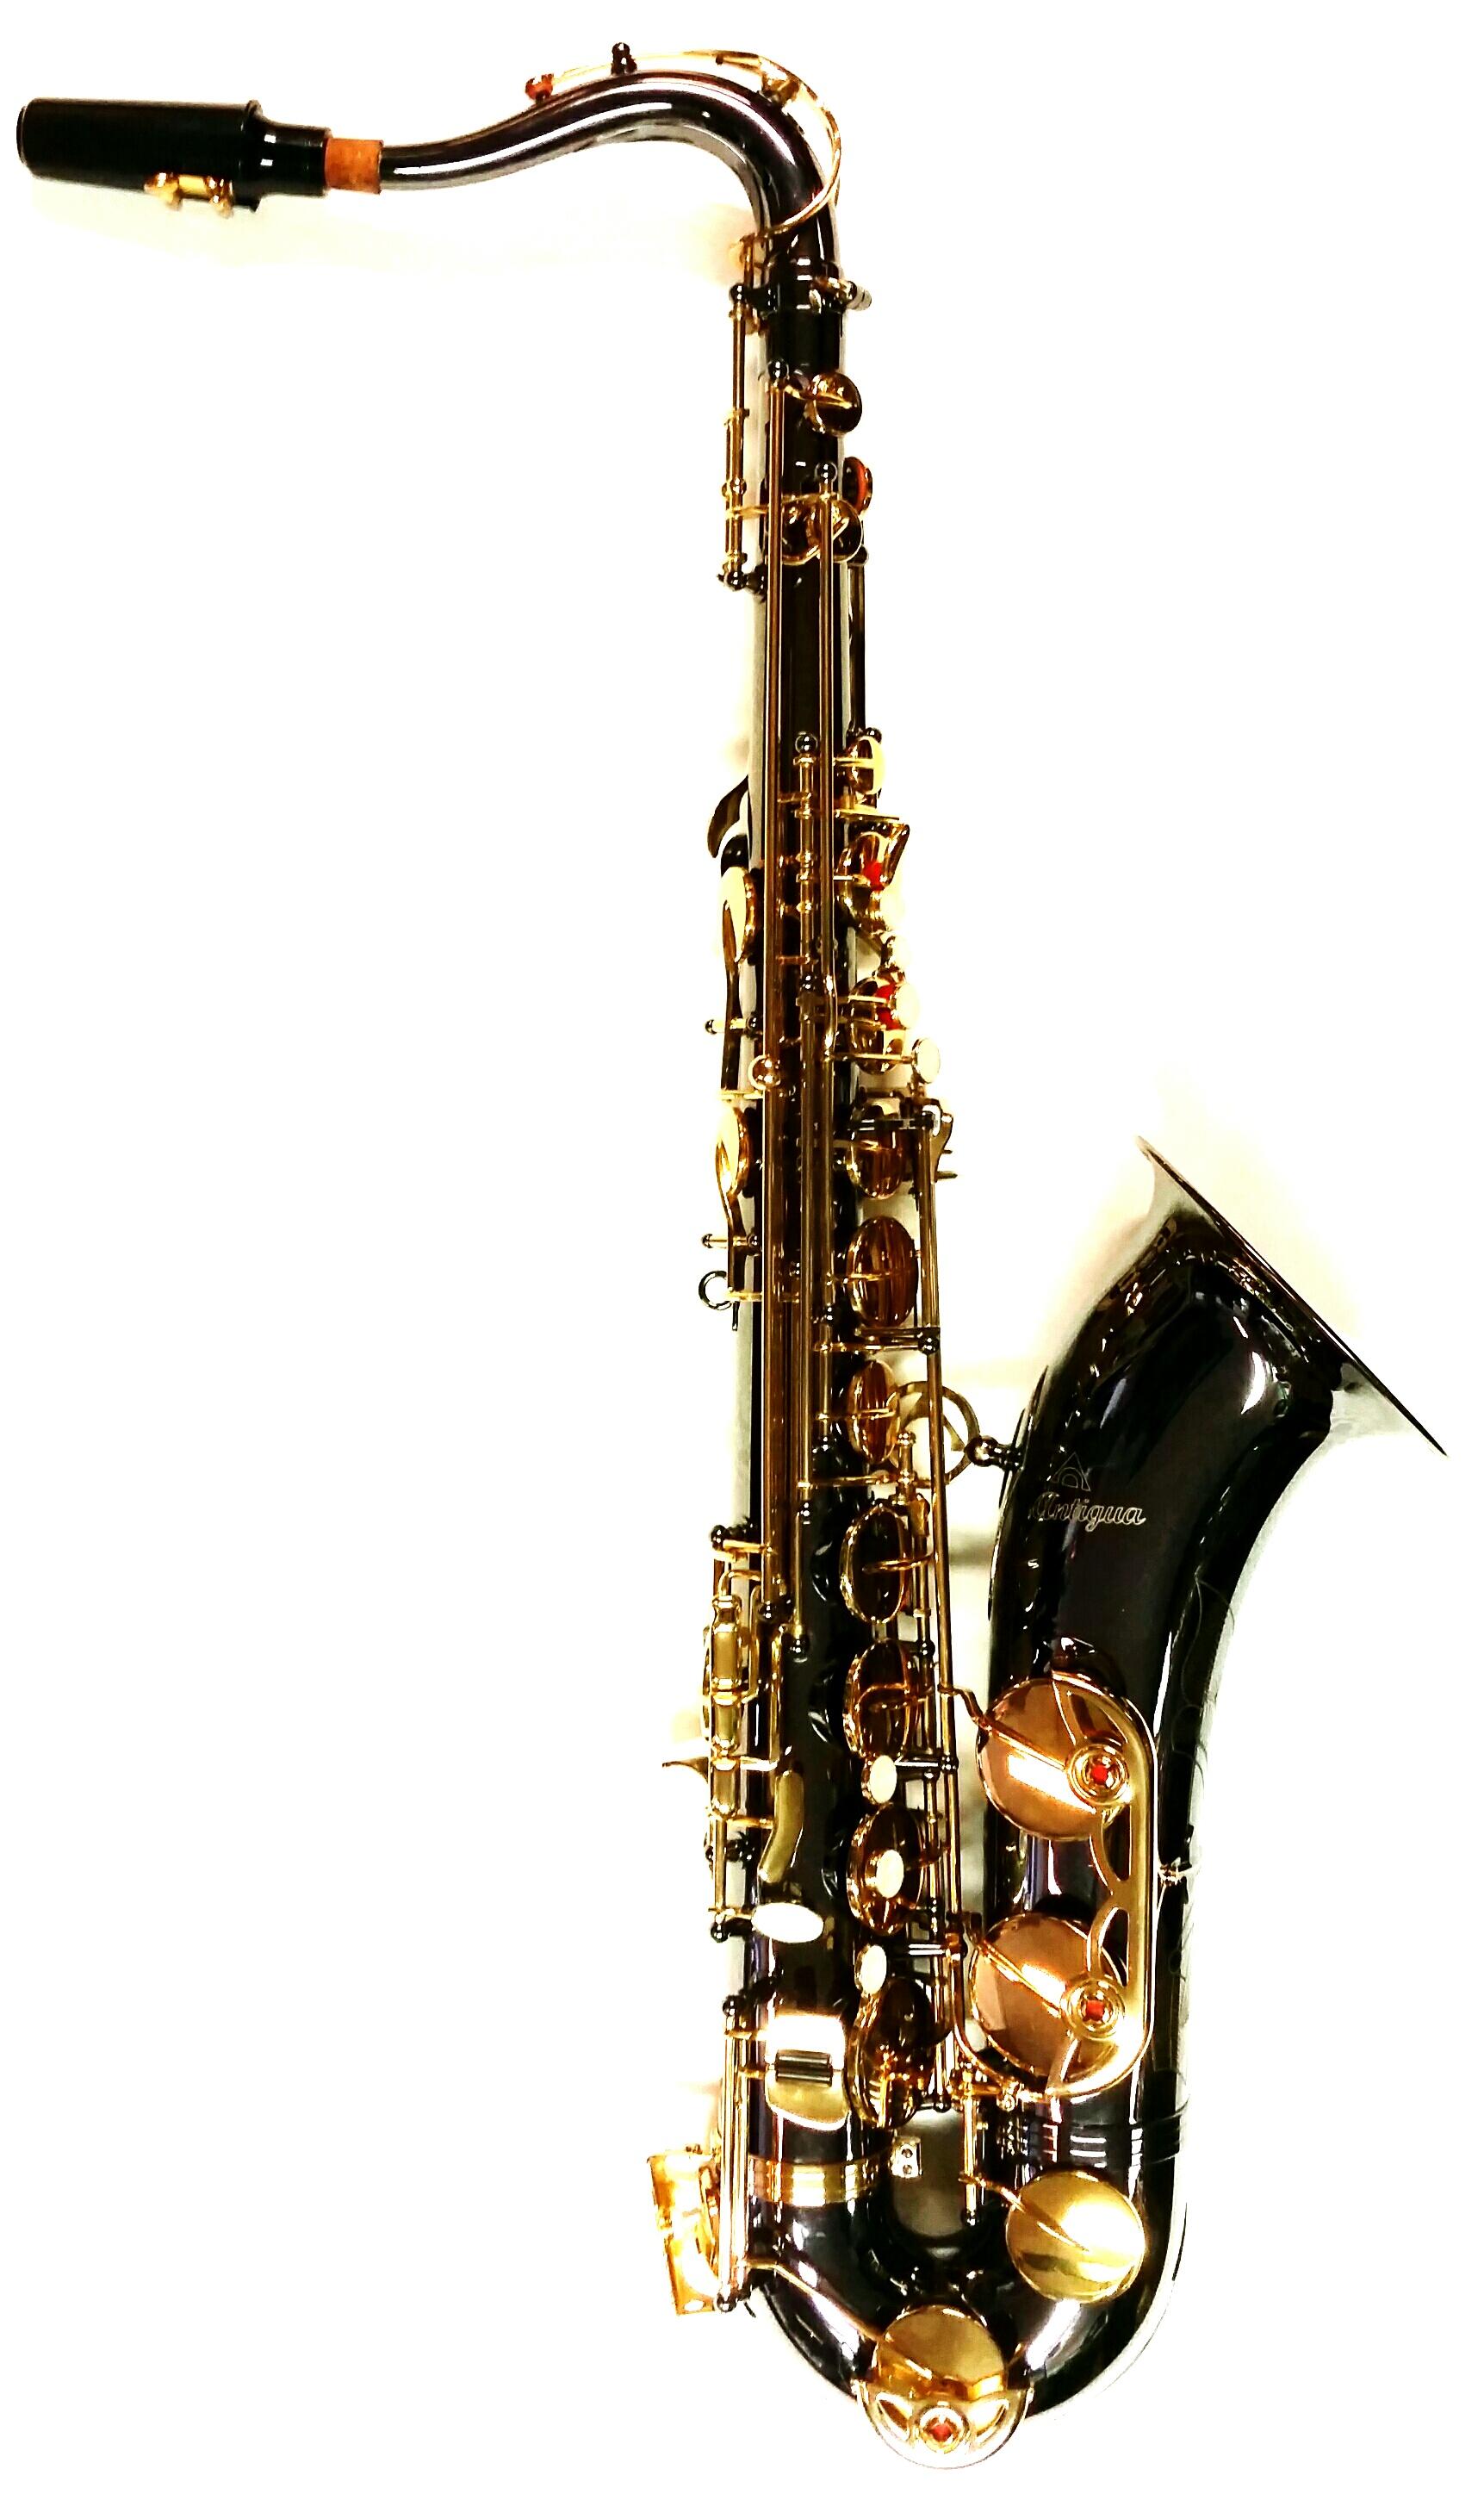 Tenor saxophone musikbrunnen musikhaus hannover for Musik hause